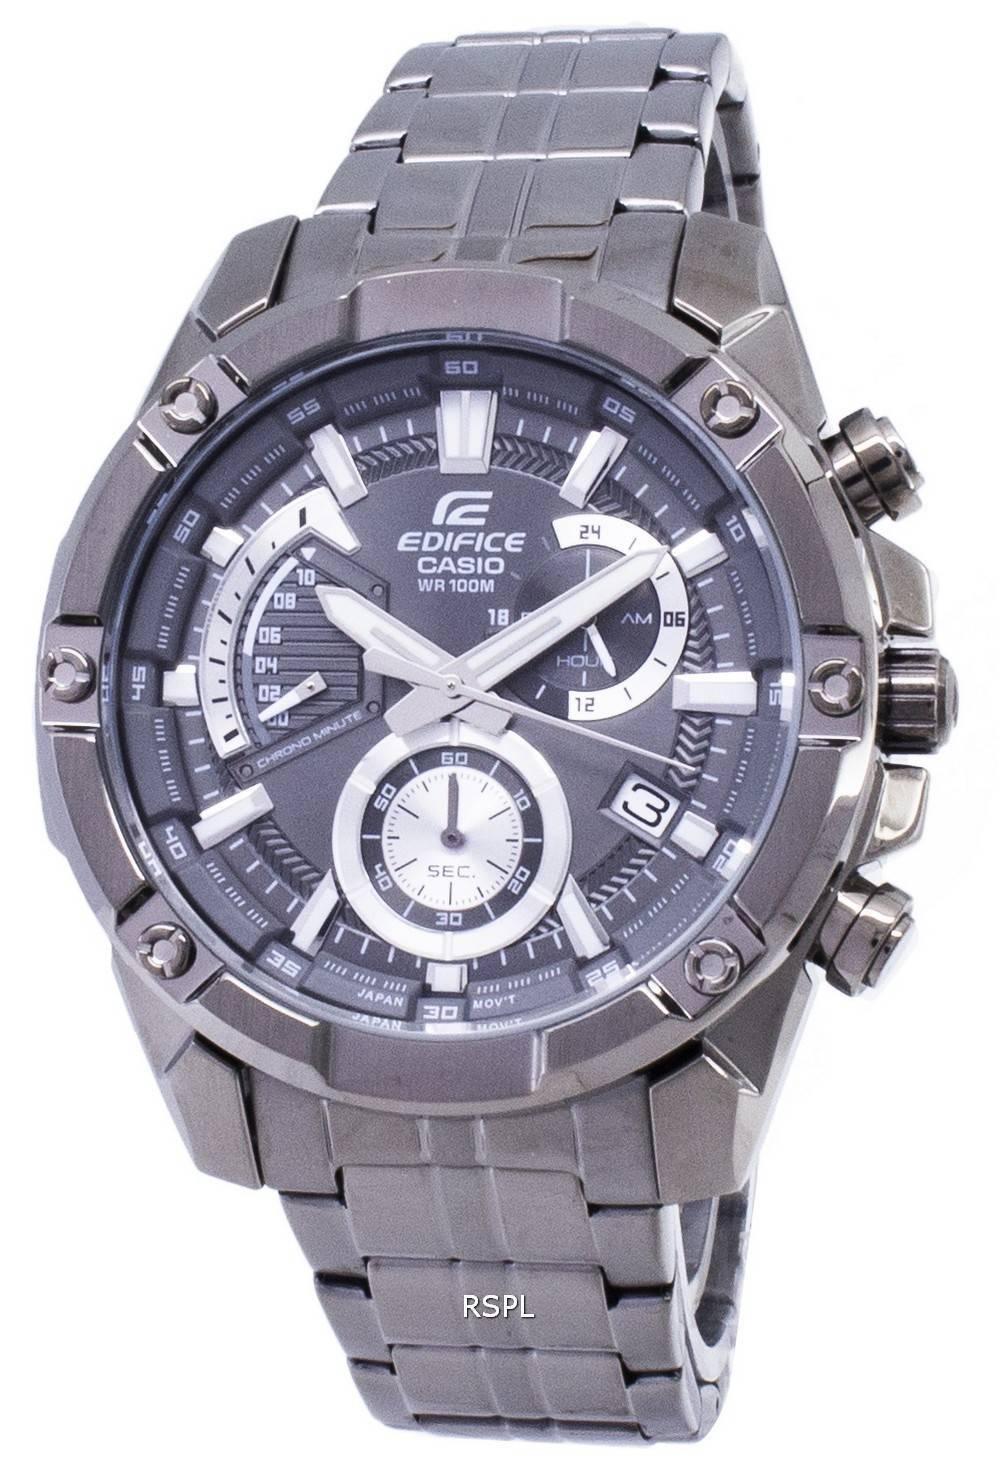 Casio Edifice EFR-559GY-1AV EFR559GY-1AV Chronograph Analog Men's Watch